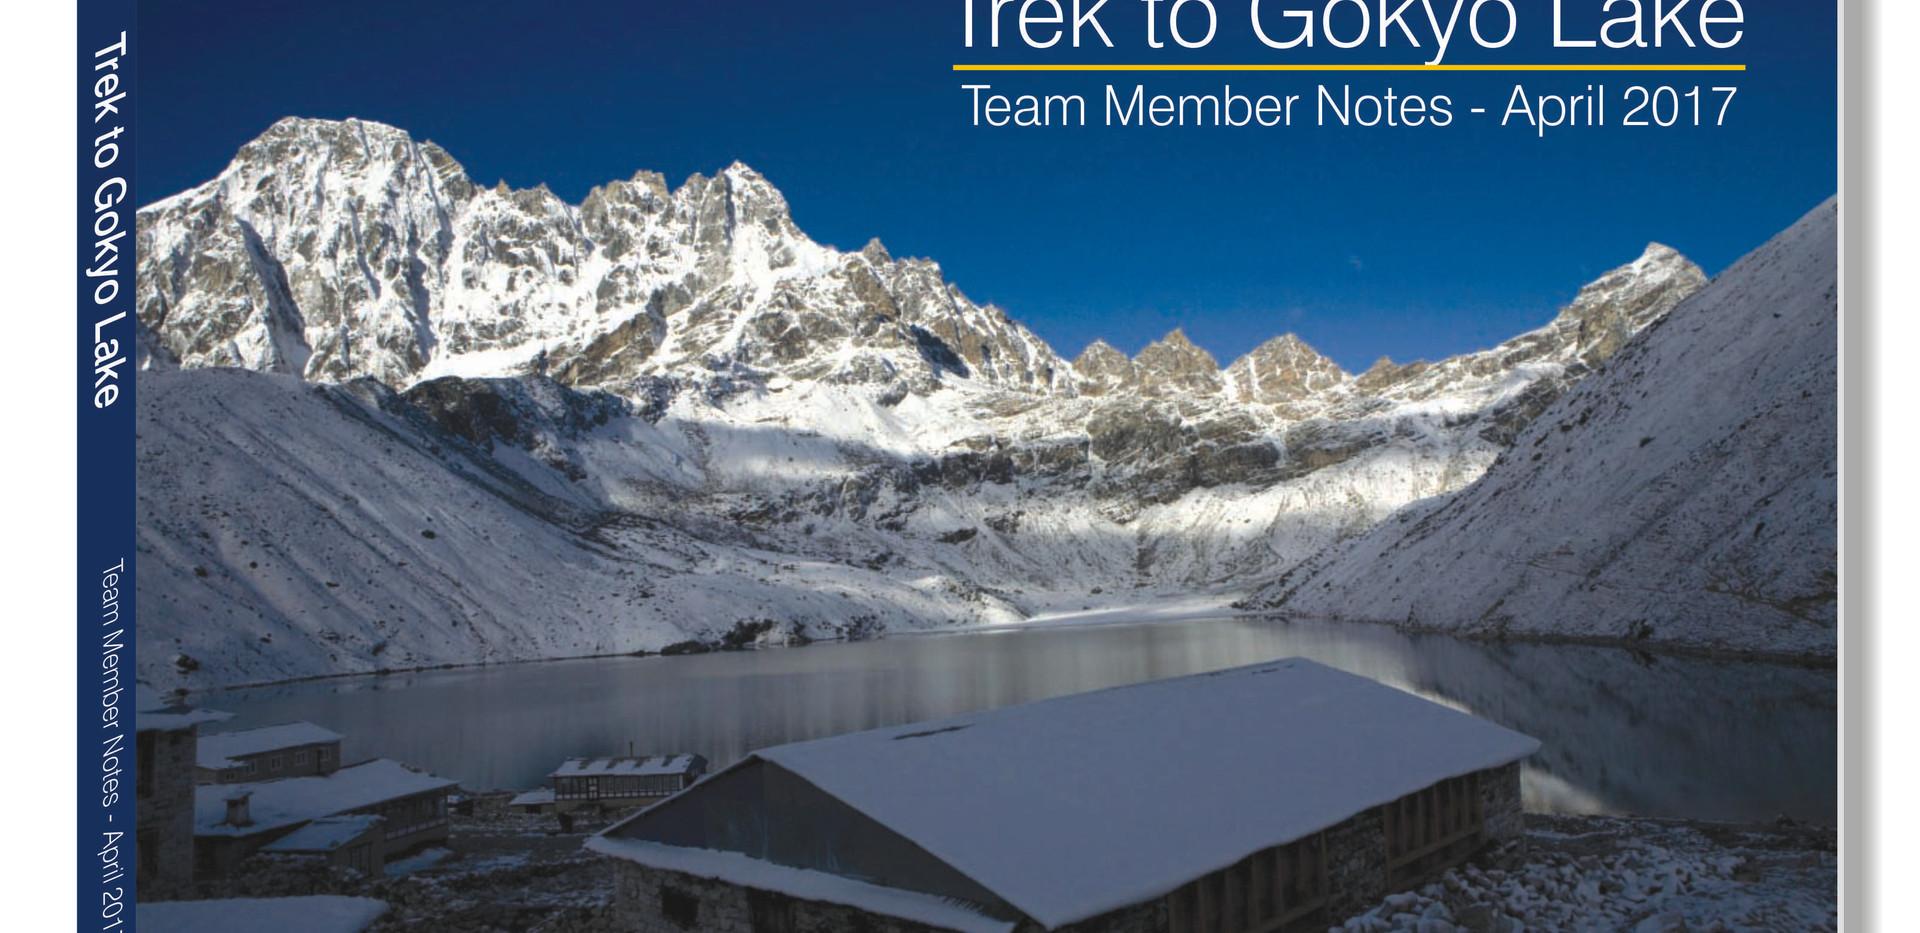 Trek to Gokyo Lake Cover.jpg